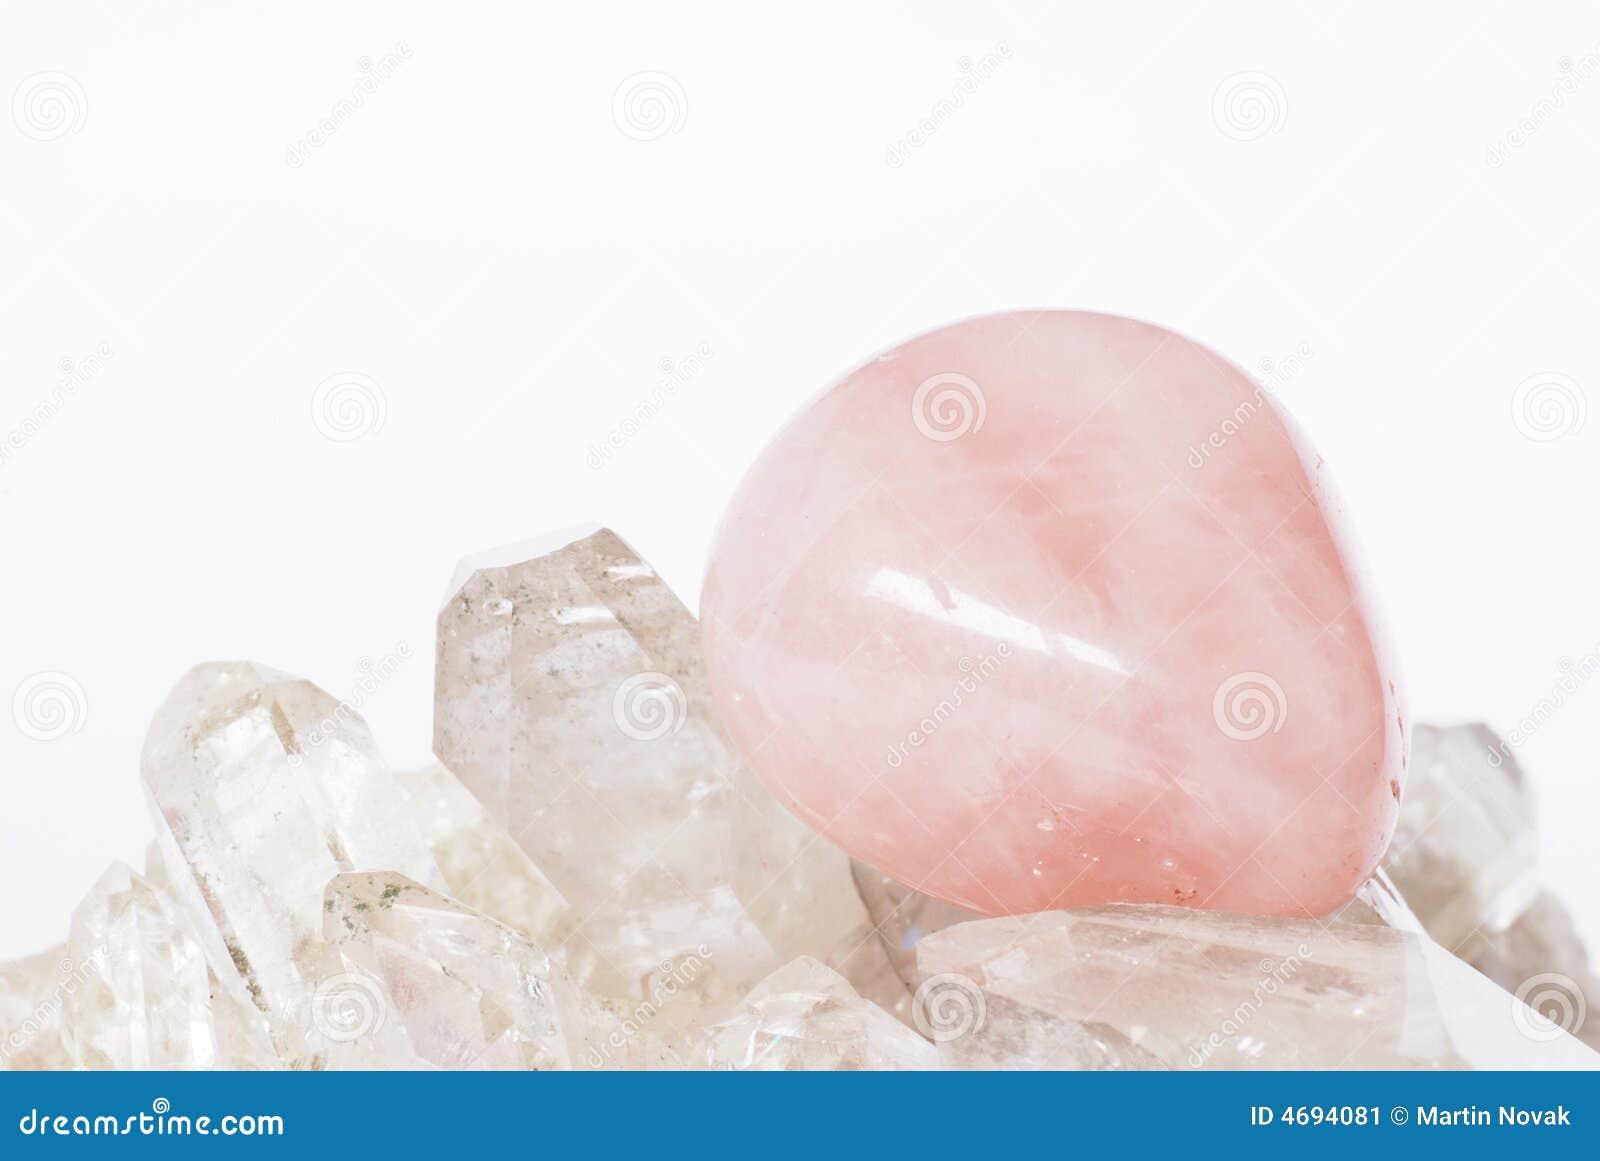 Kryształ kwarcu rose